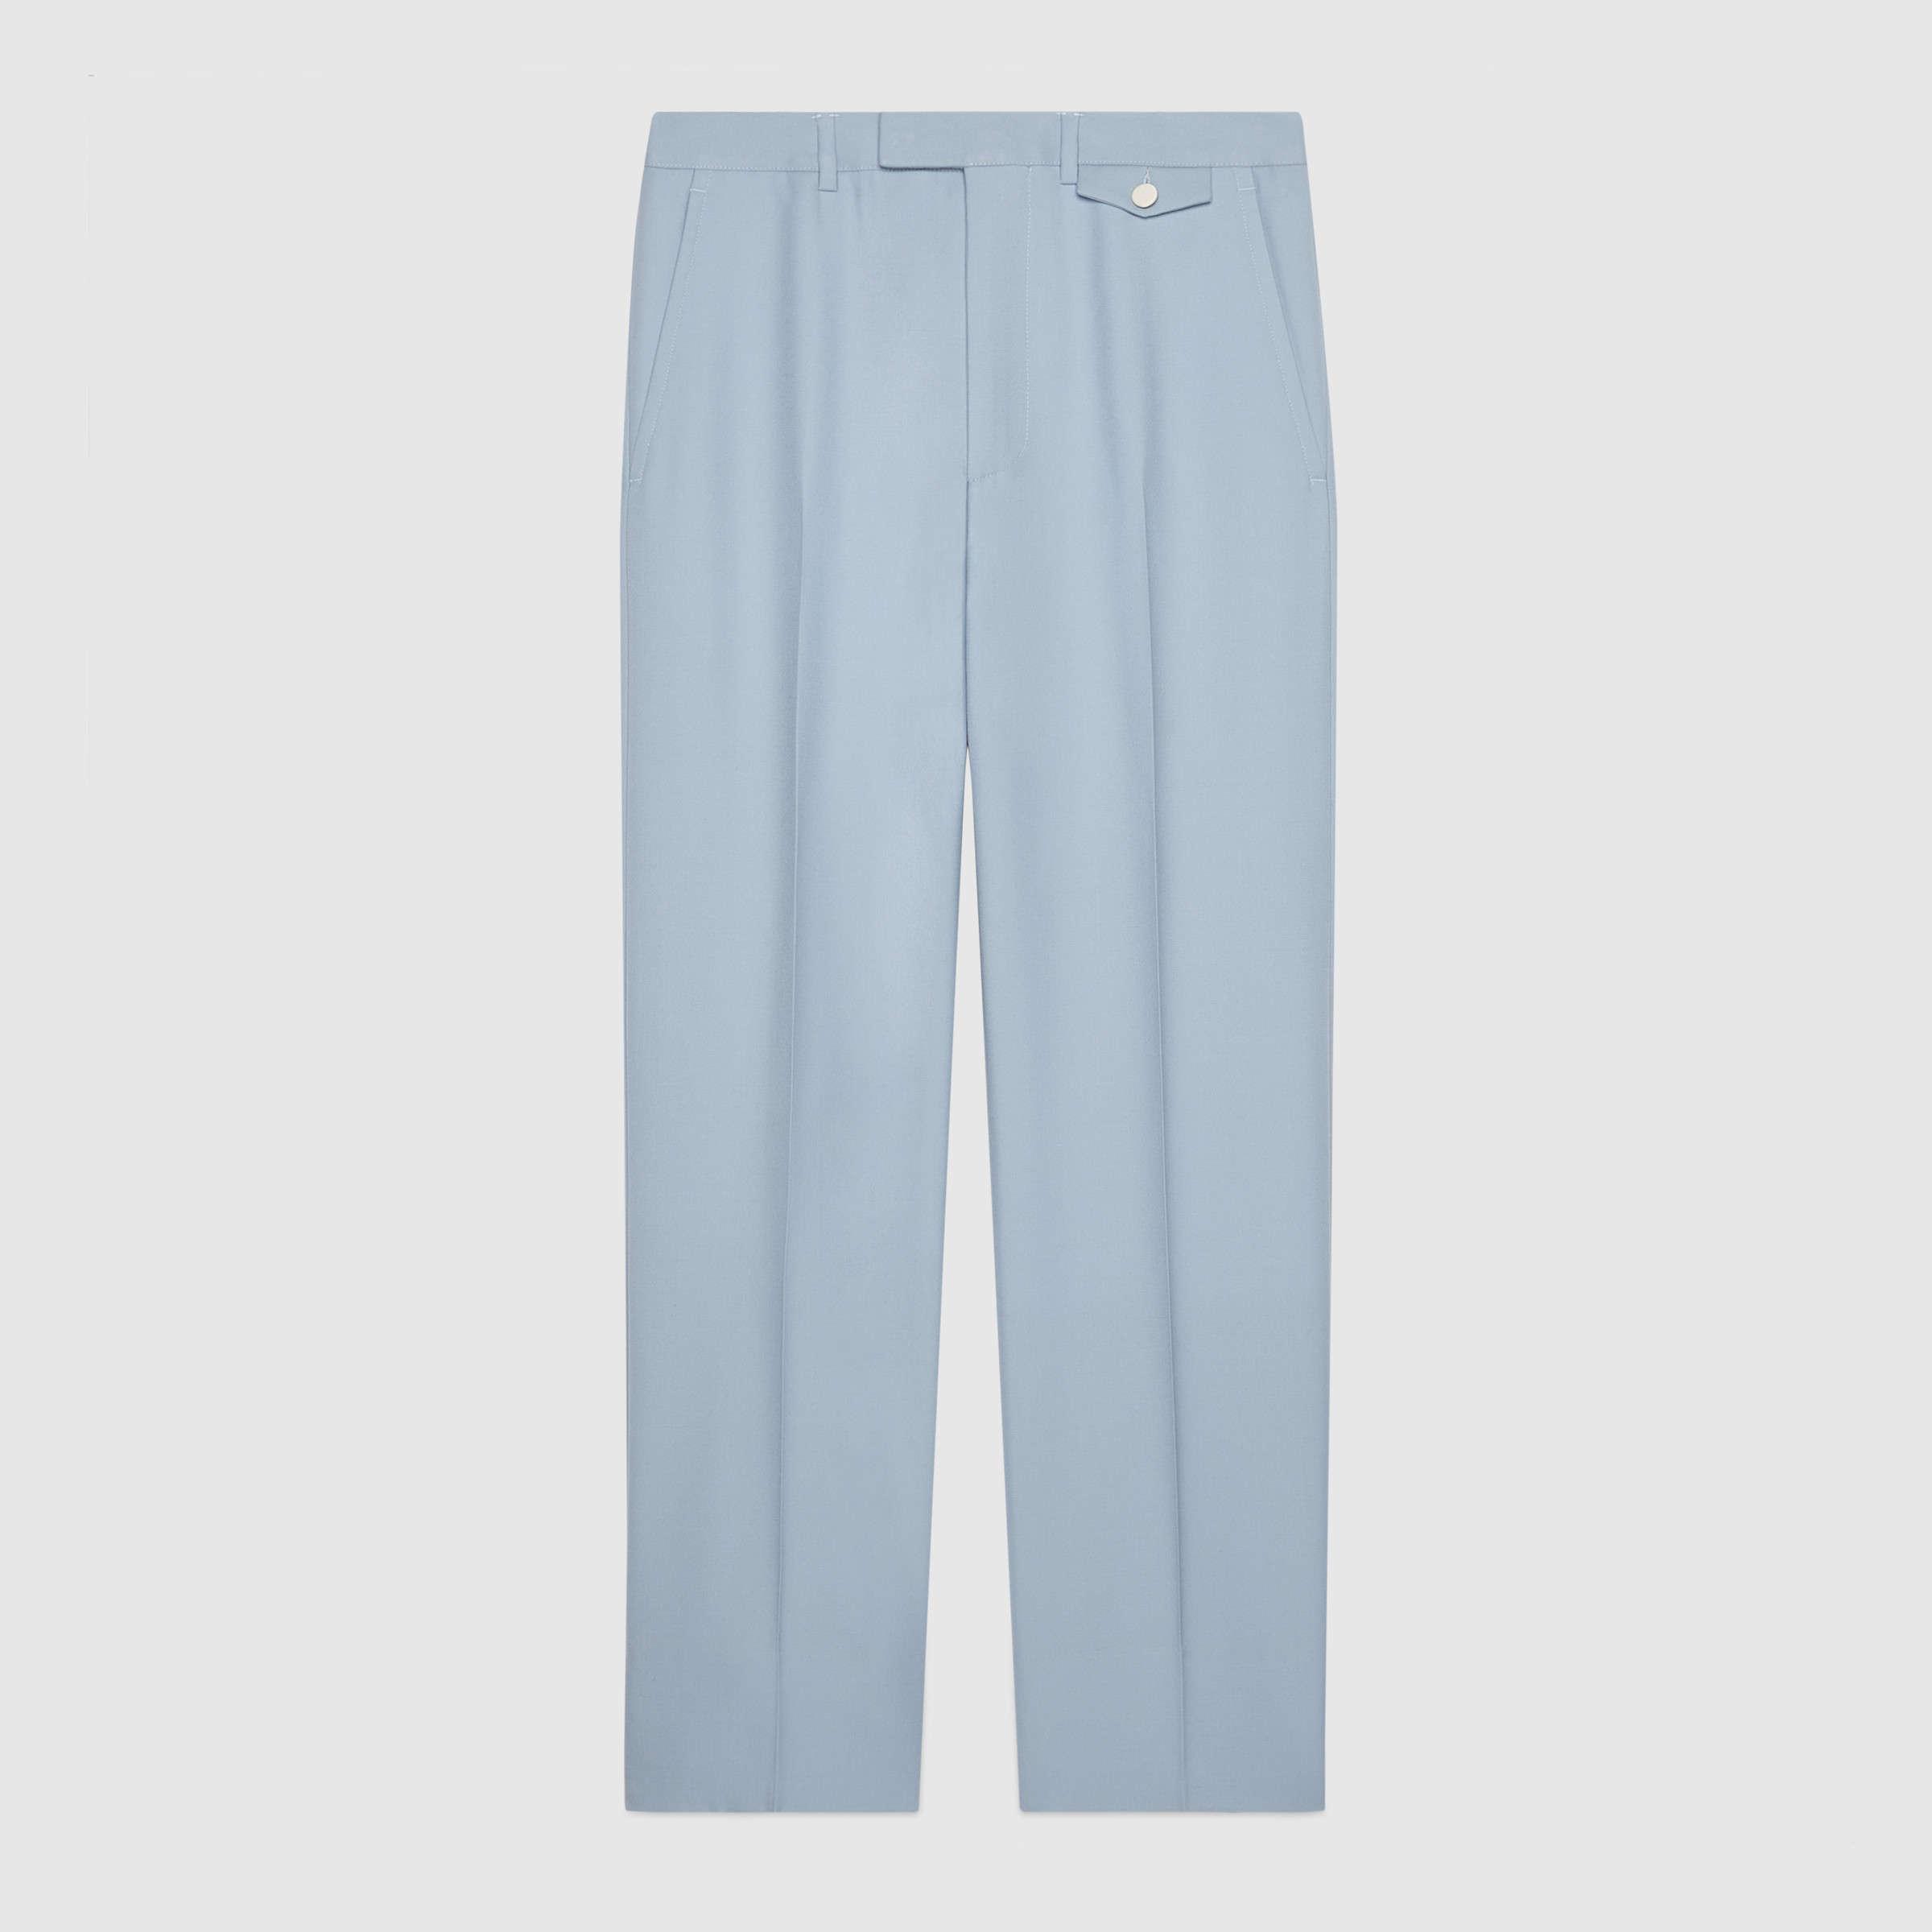 Denim clipart boy pants Shop with Gucci com Wool